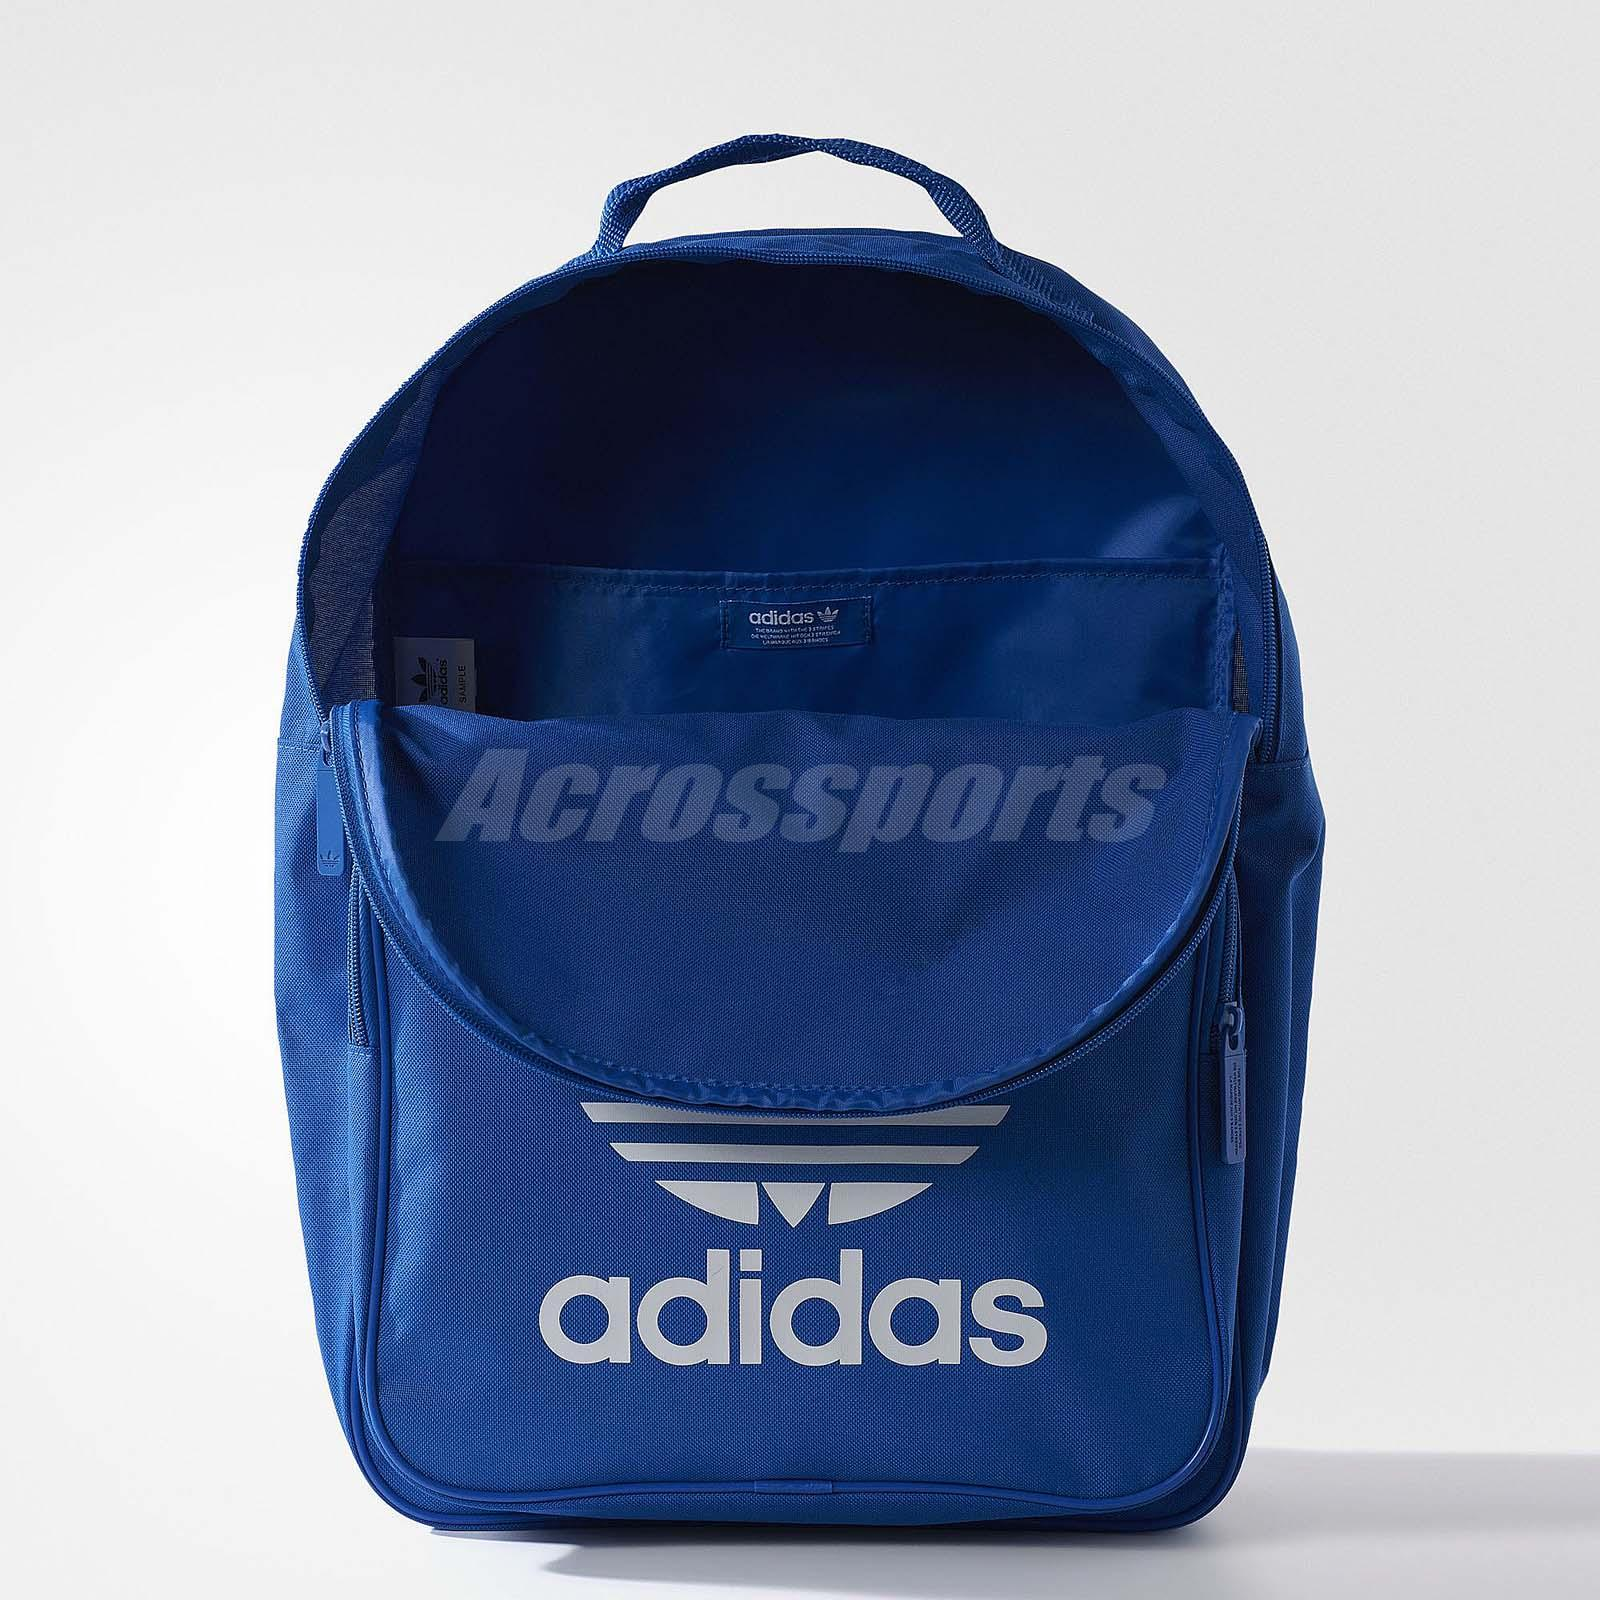 adidas Originals Trefoil Blue White Men Polyester Backpack BP Bag ... 7db8adf7cfb23